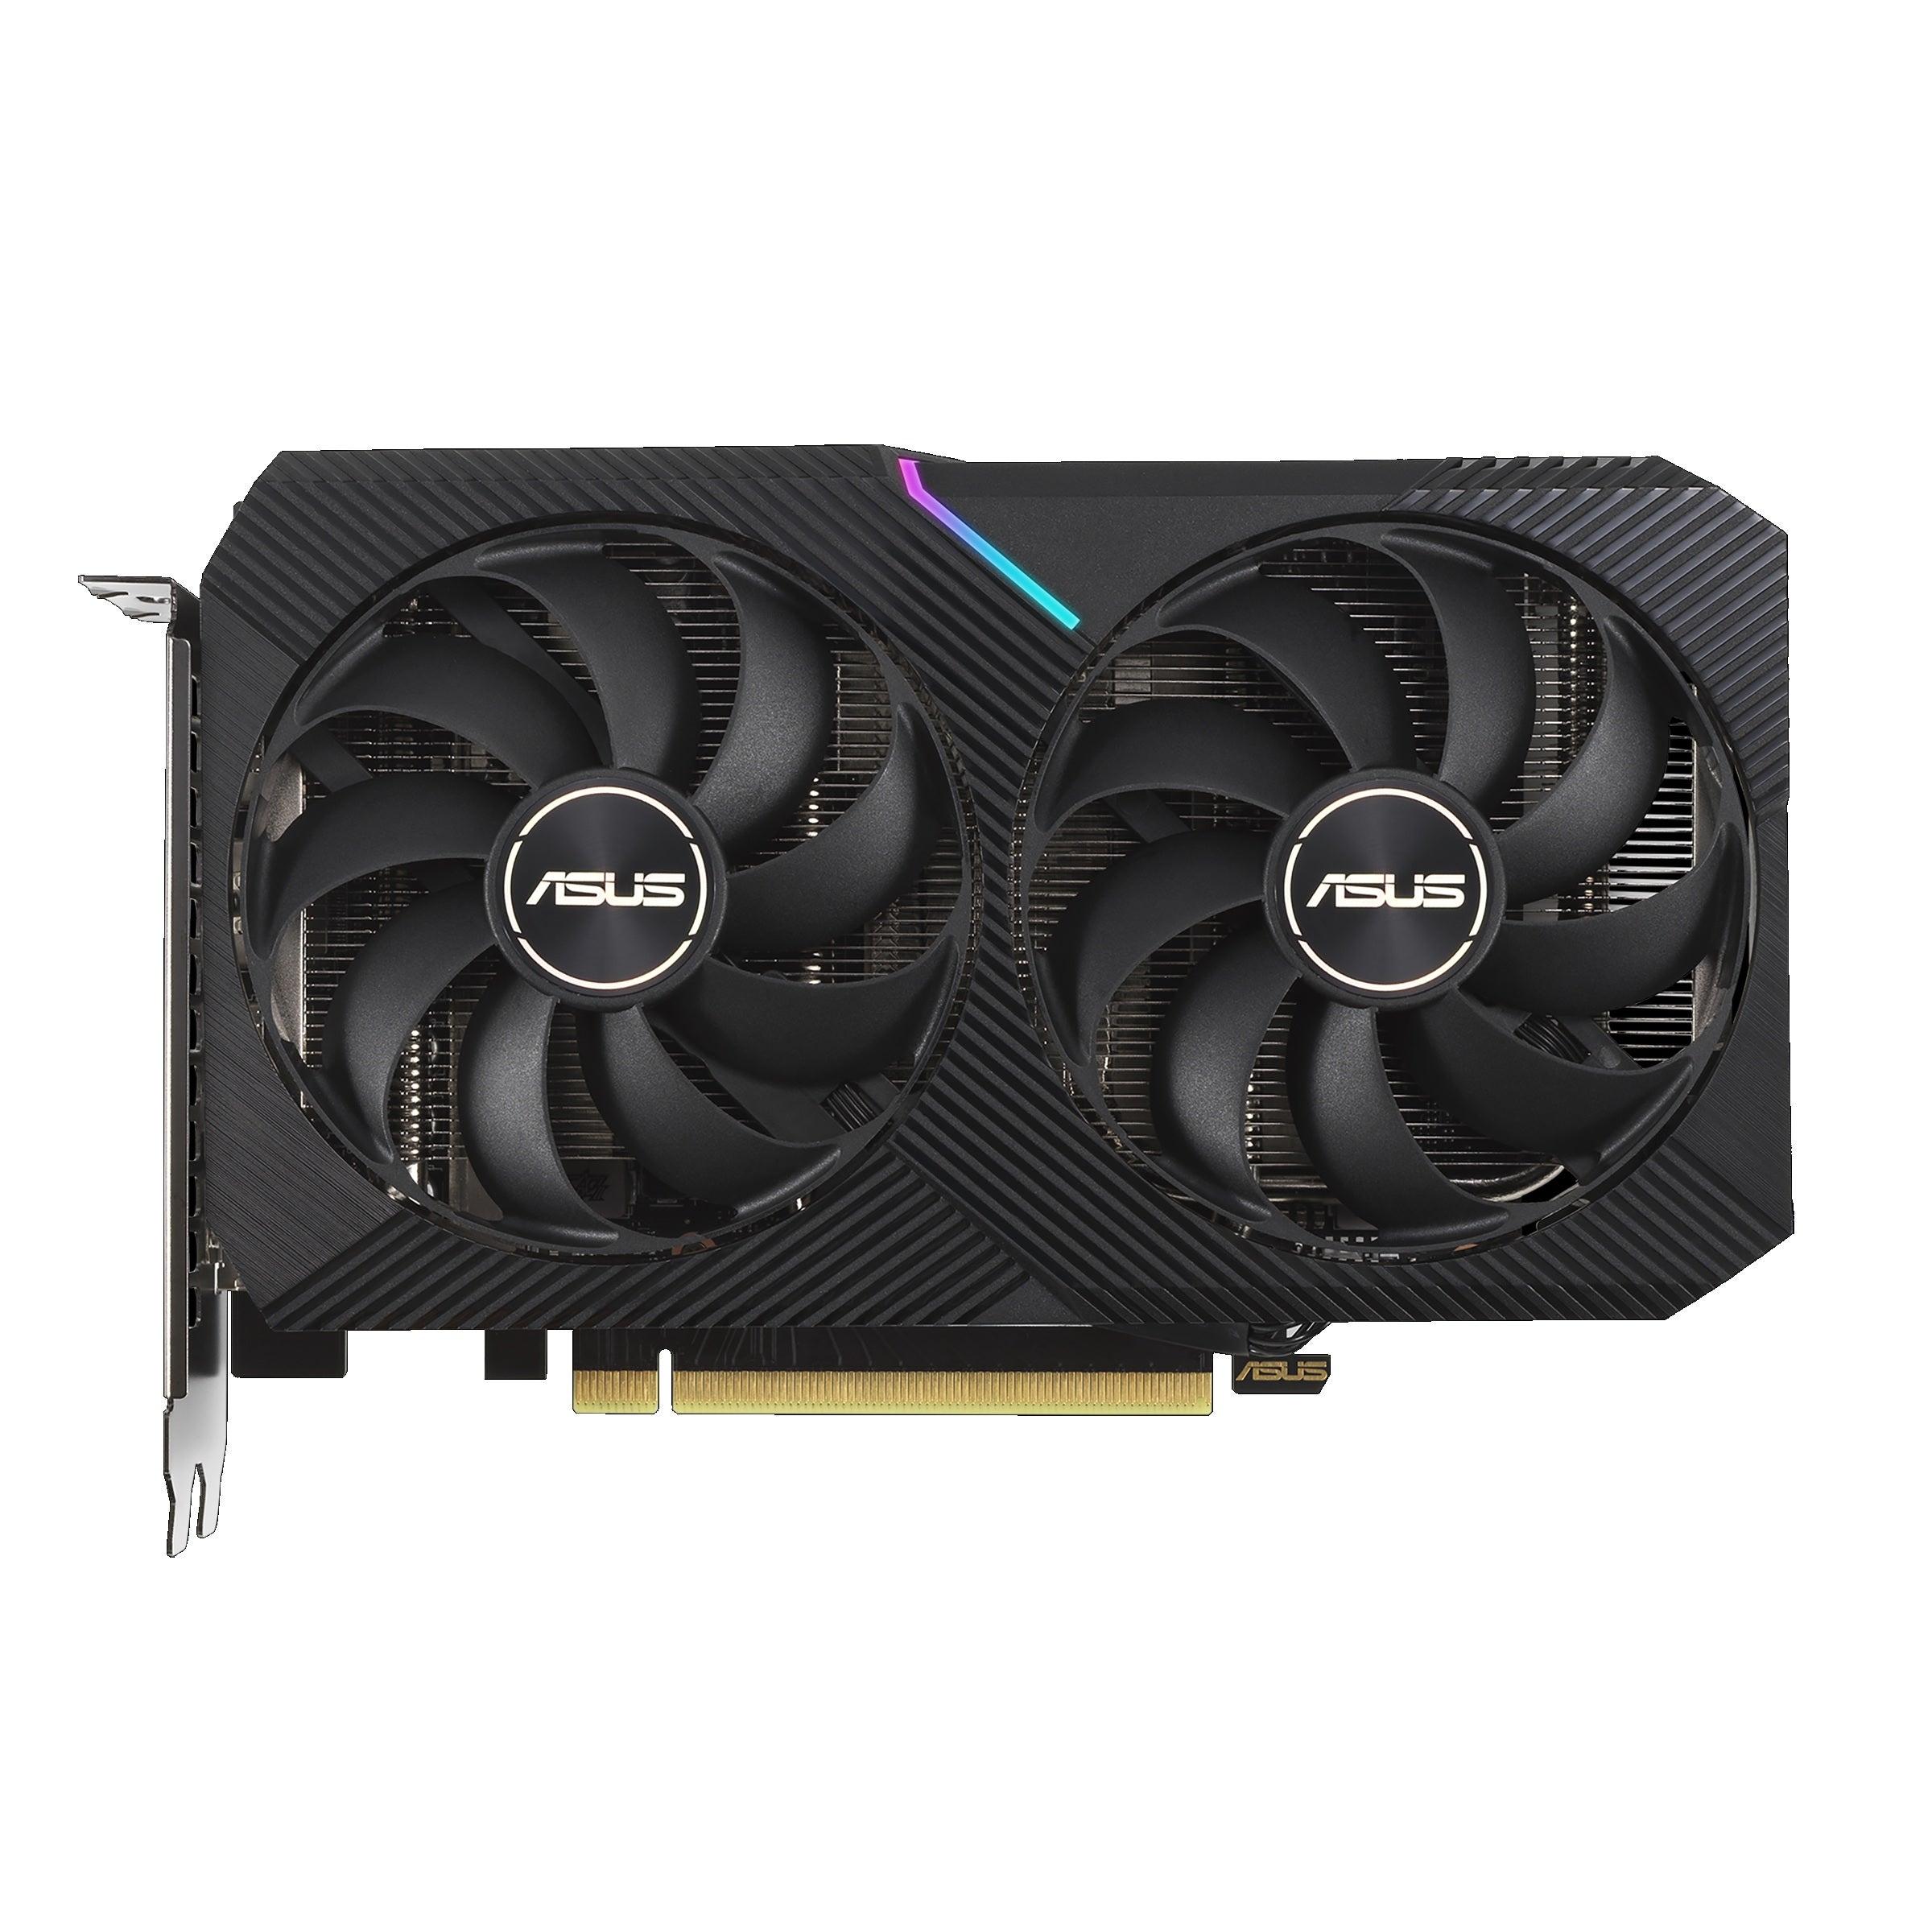 Asus Dual GeForce RTX 3060 Ti V2 Mini OC Edition Graphics Card